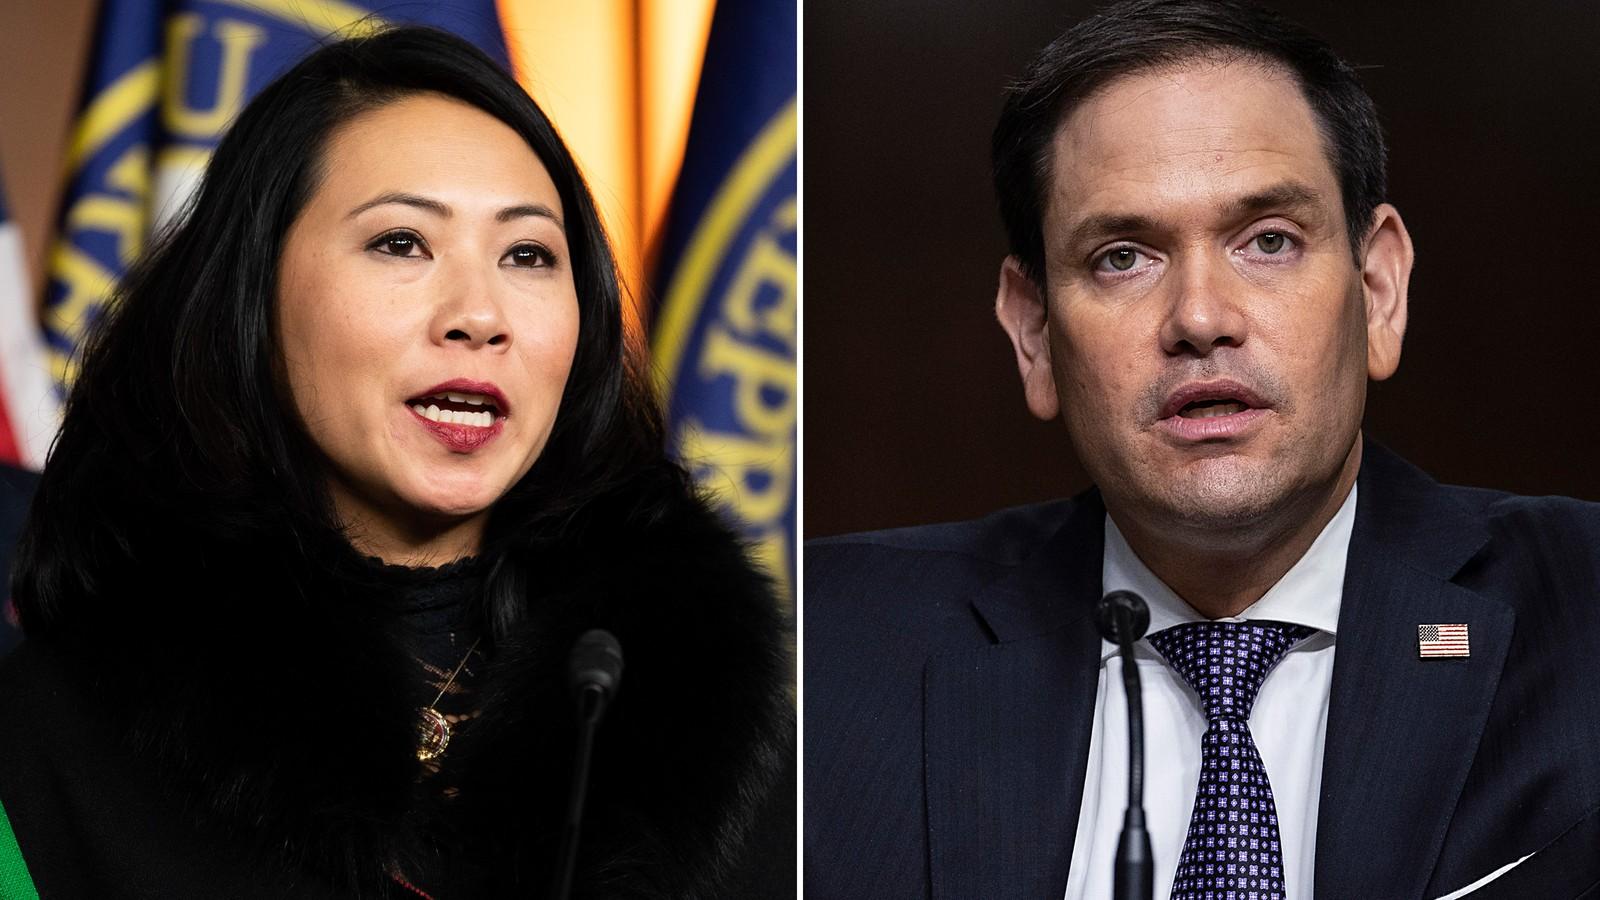 Democratic Rep. Stephanie Murphy considers Senate bid against Marco Rubio